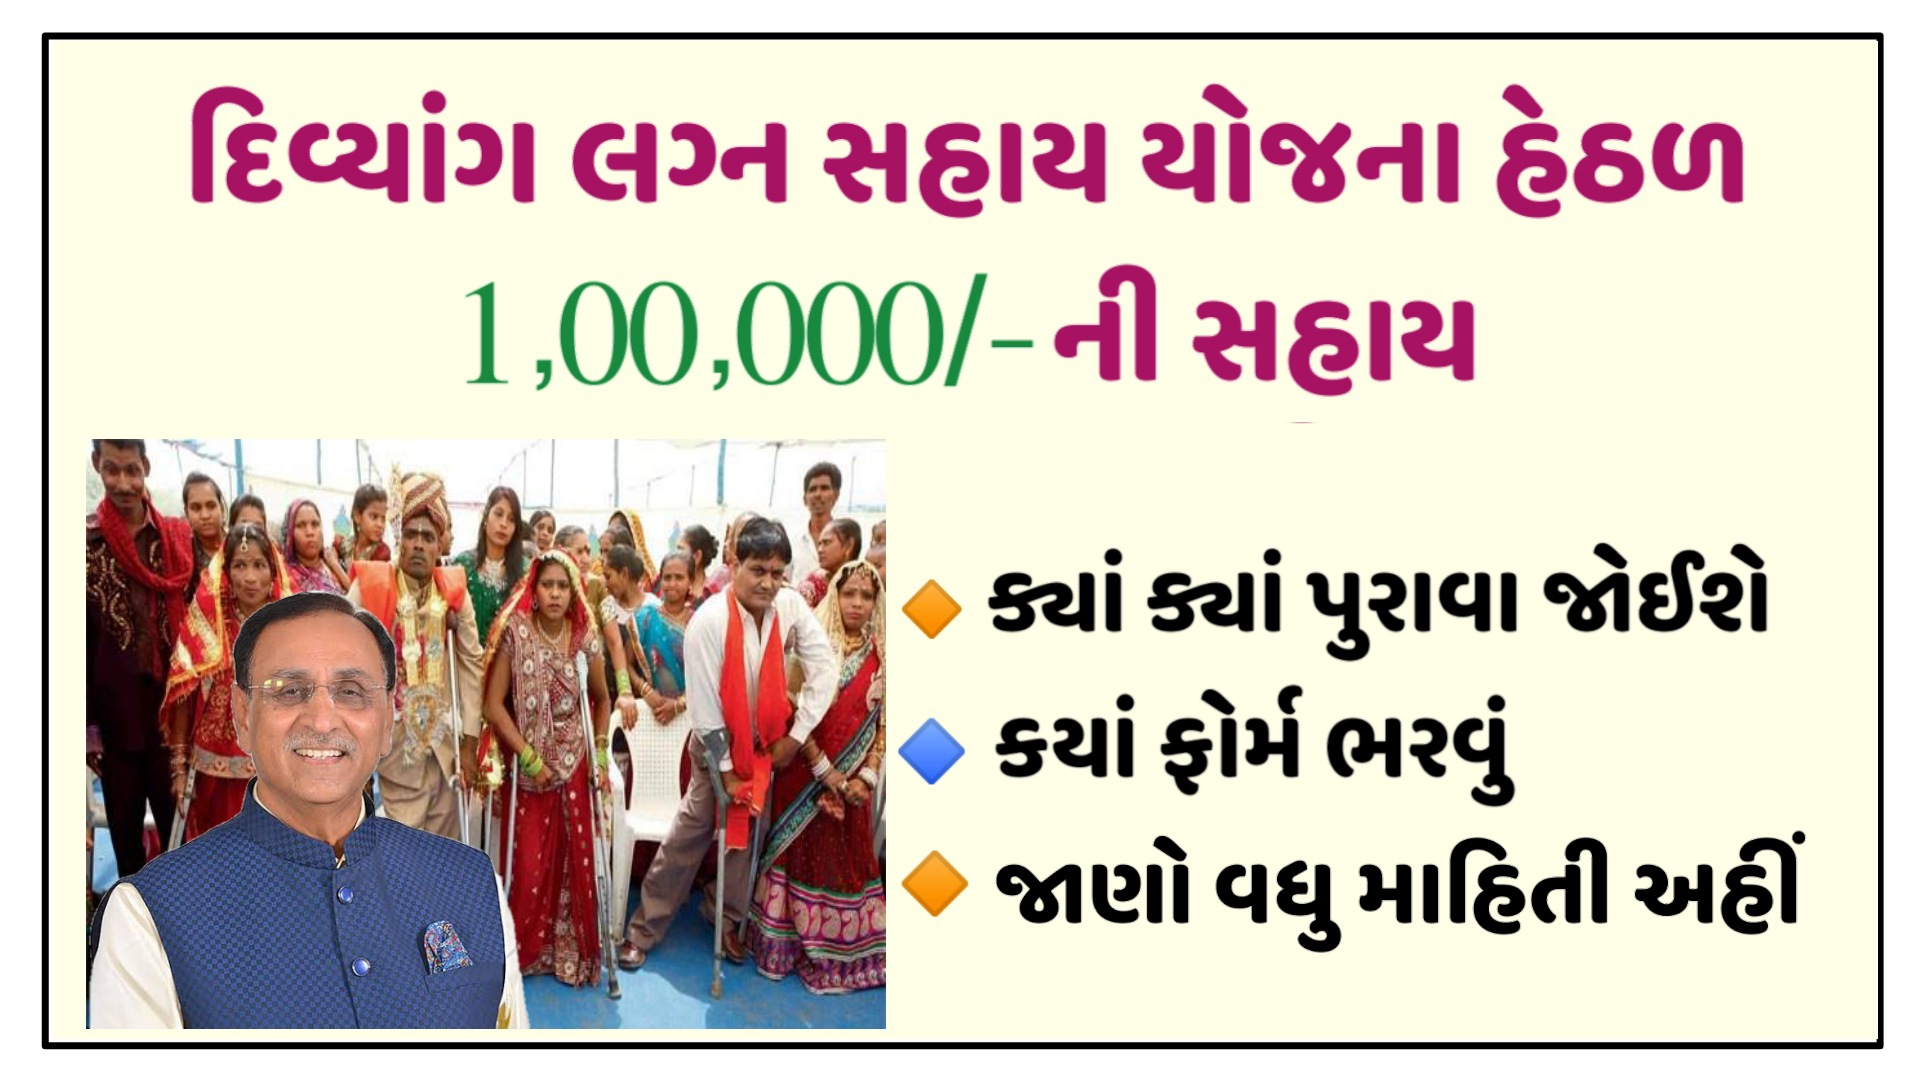 Divyang Marriage Assistance Scheme 1,00,000 Help 2021